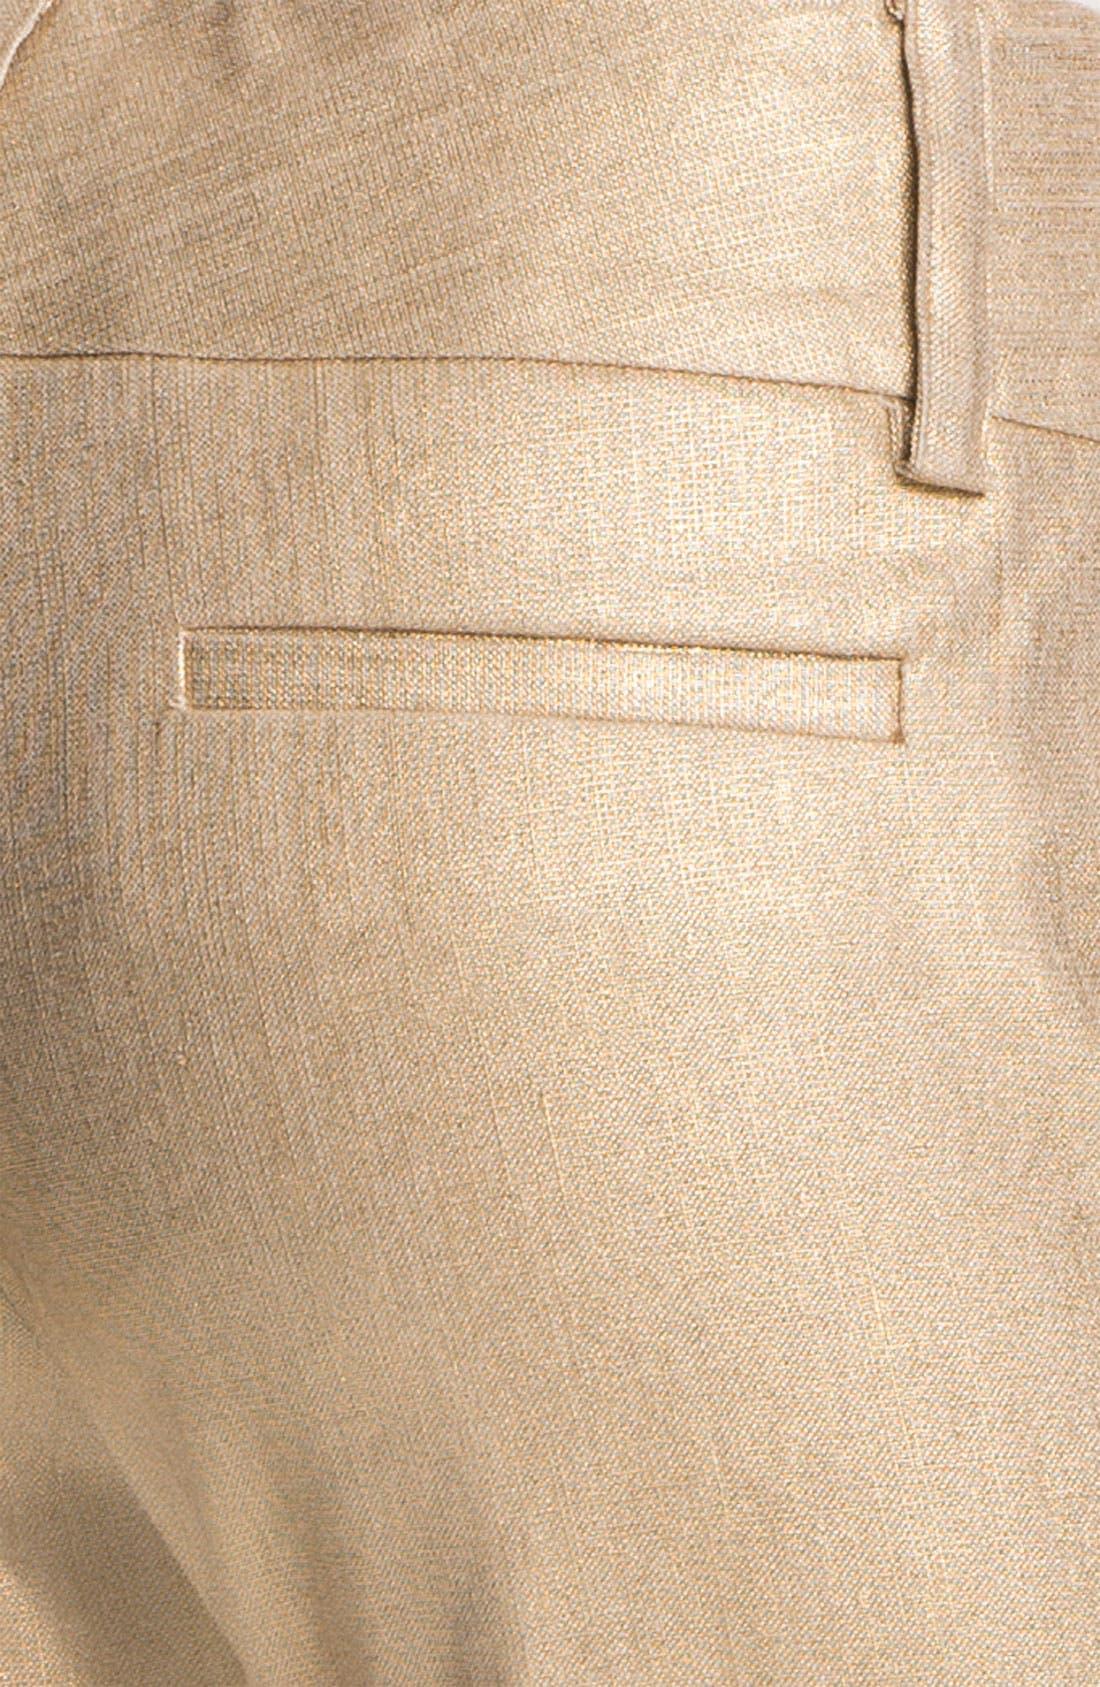 'Olivia' Wide Leg Stretch Pants,                             Alternate thumbnail 2, color,                             710